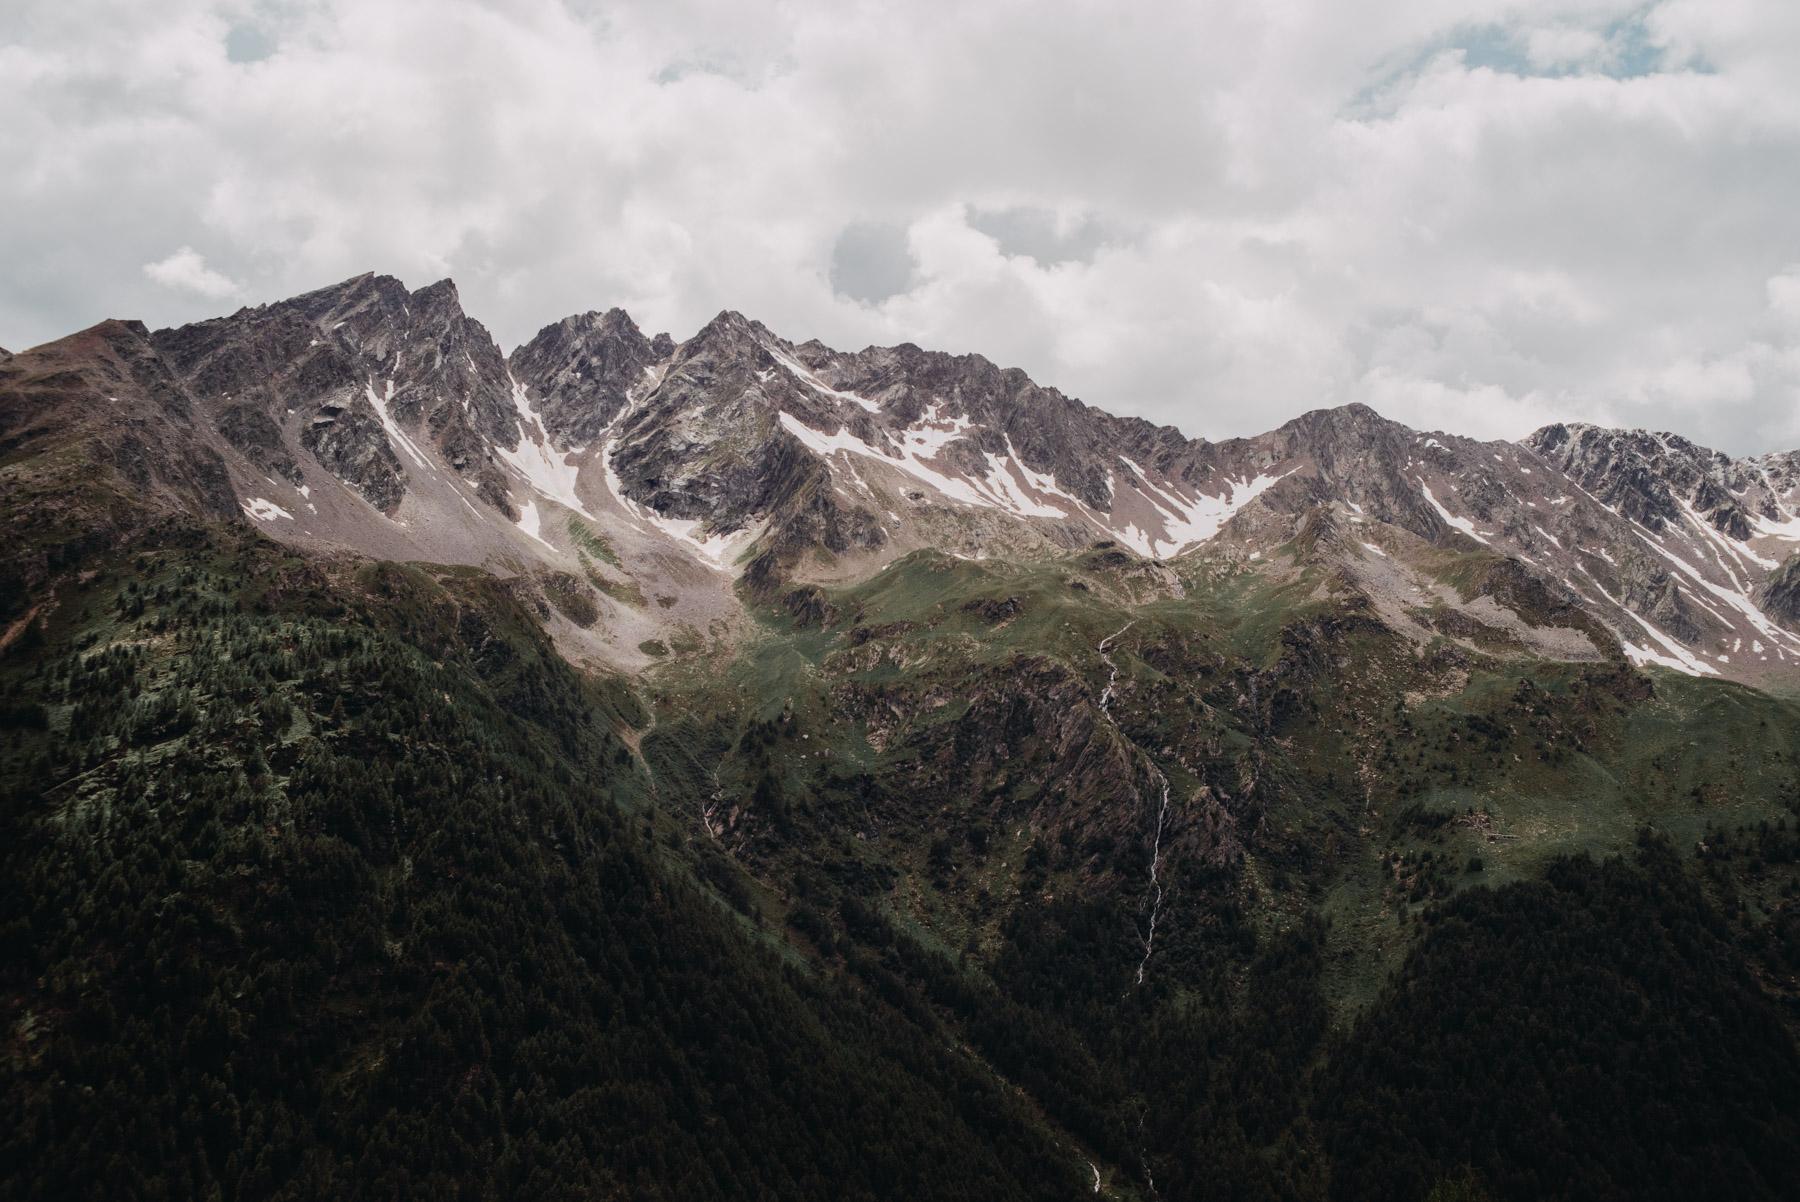 Stelvio Pass, Gavia pass, Bormio Mountans and Valtellina Mountains